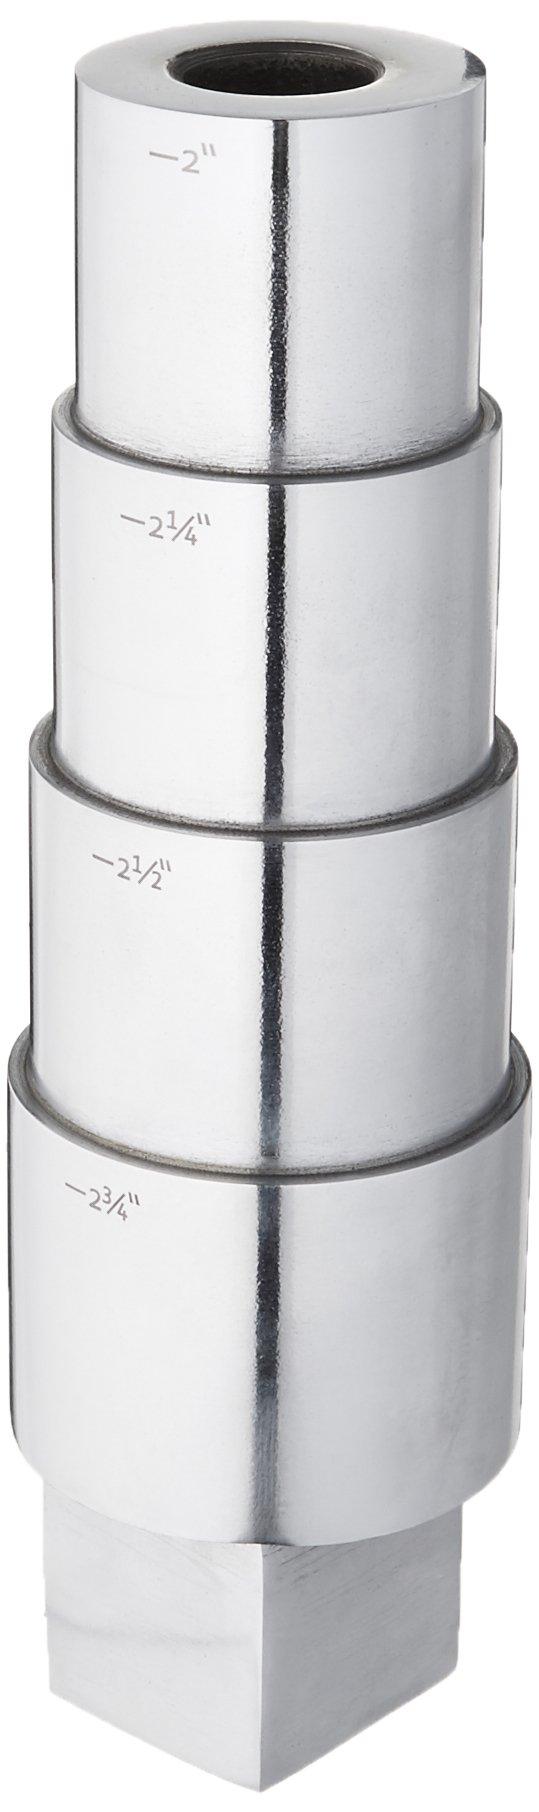 SE 9'' Oval Stepped Bracelet Mandrel with Tang by SE